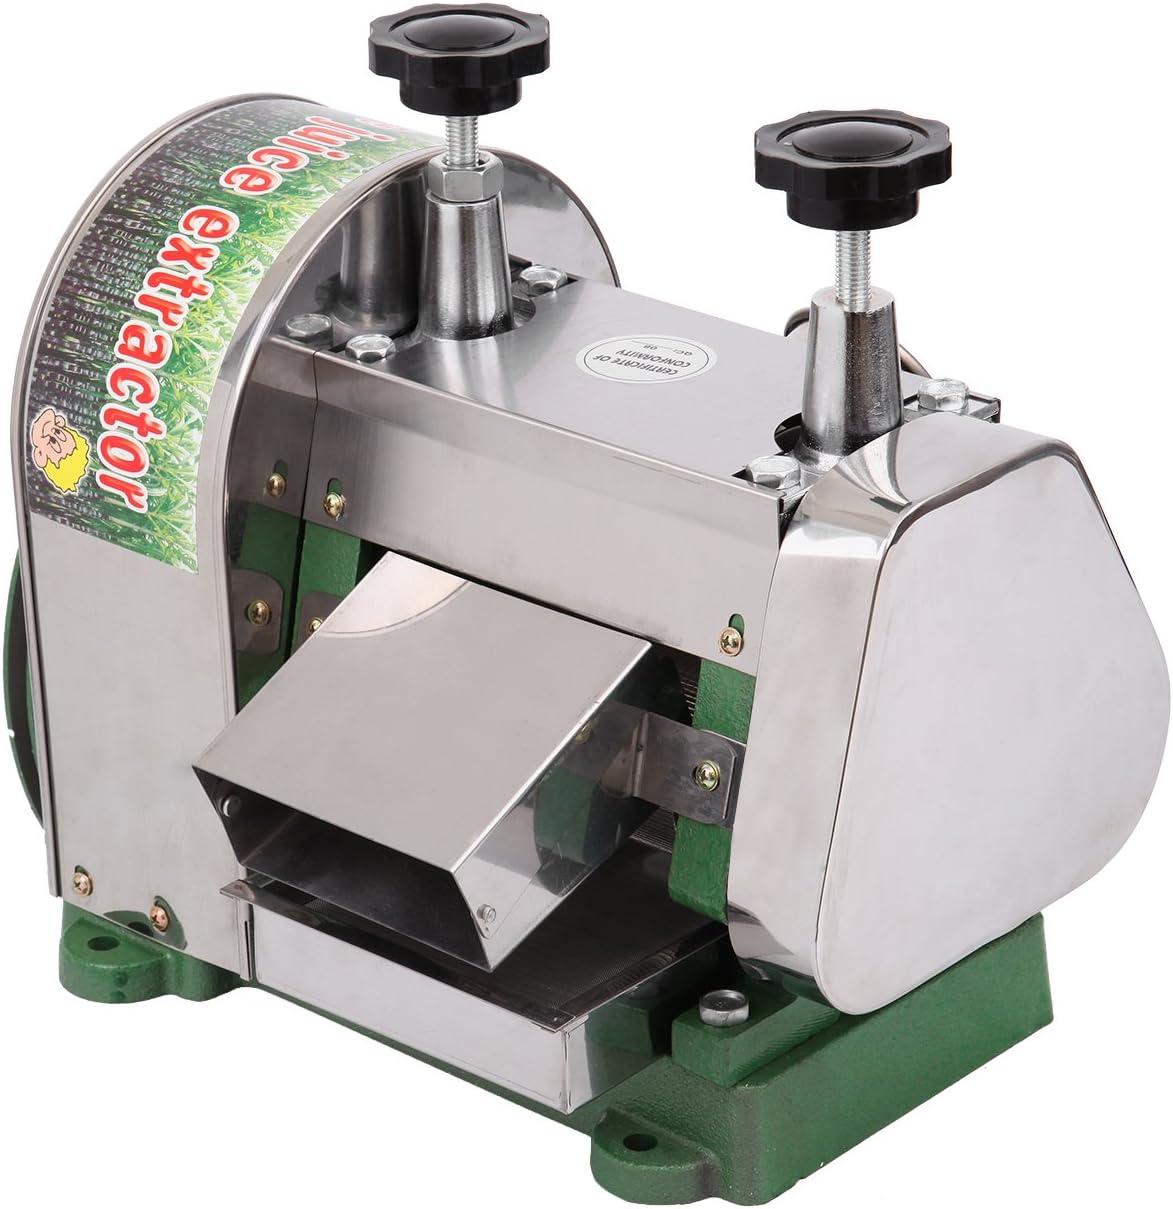 TryE Sugarcane Juicer Machine Manual Sugar Cane Press Extractor Squeezer